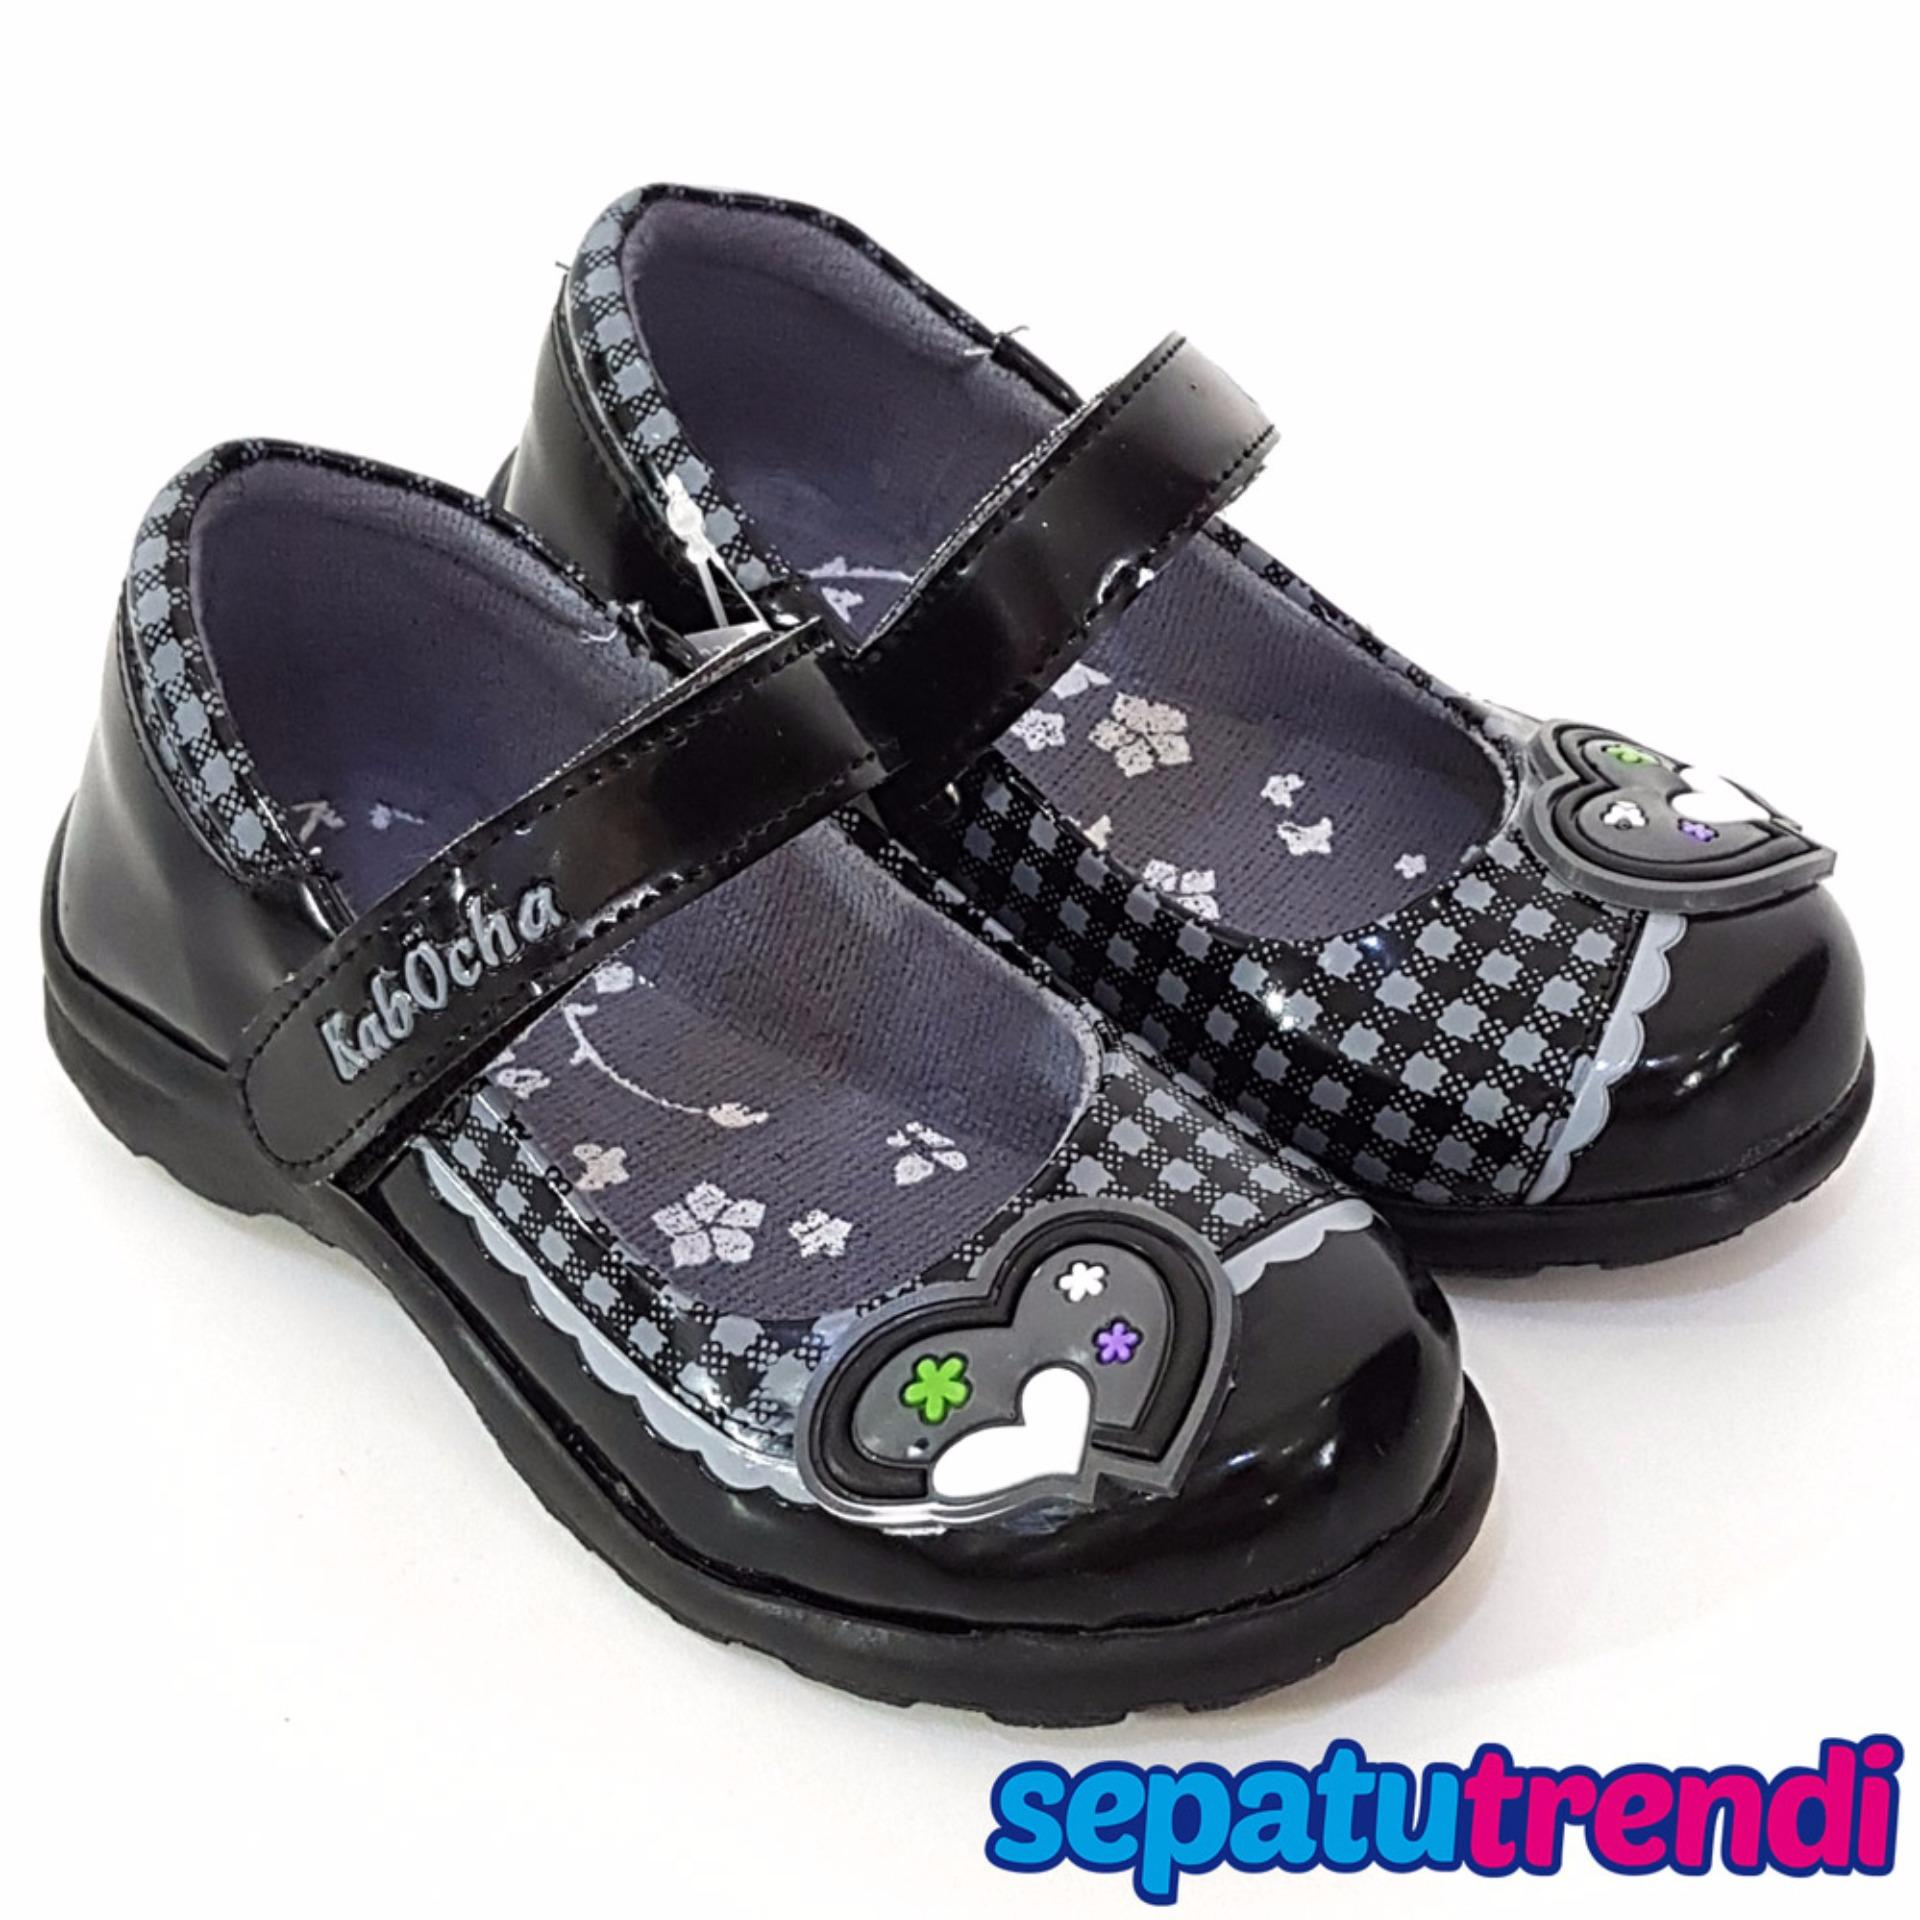 Beli Trendishoes Sepatu Sekolah Anak Perempuan Mary Jane Motif Boneka Random Kvb01 Hitam Murah